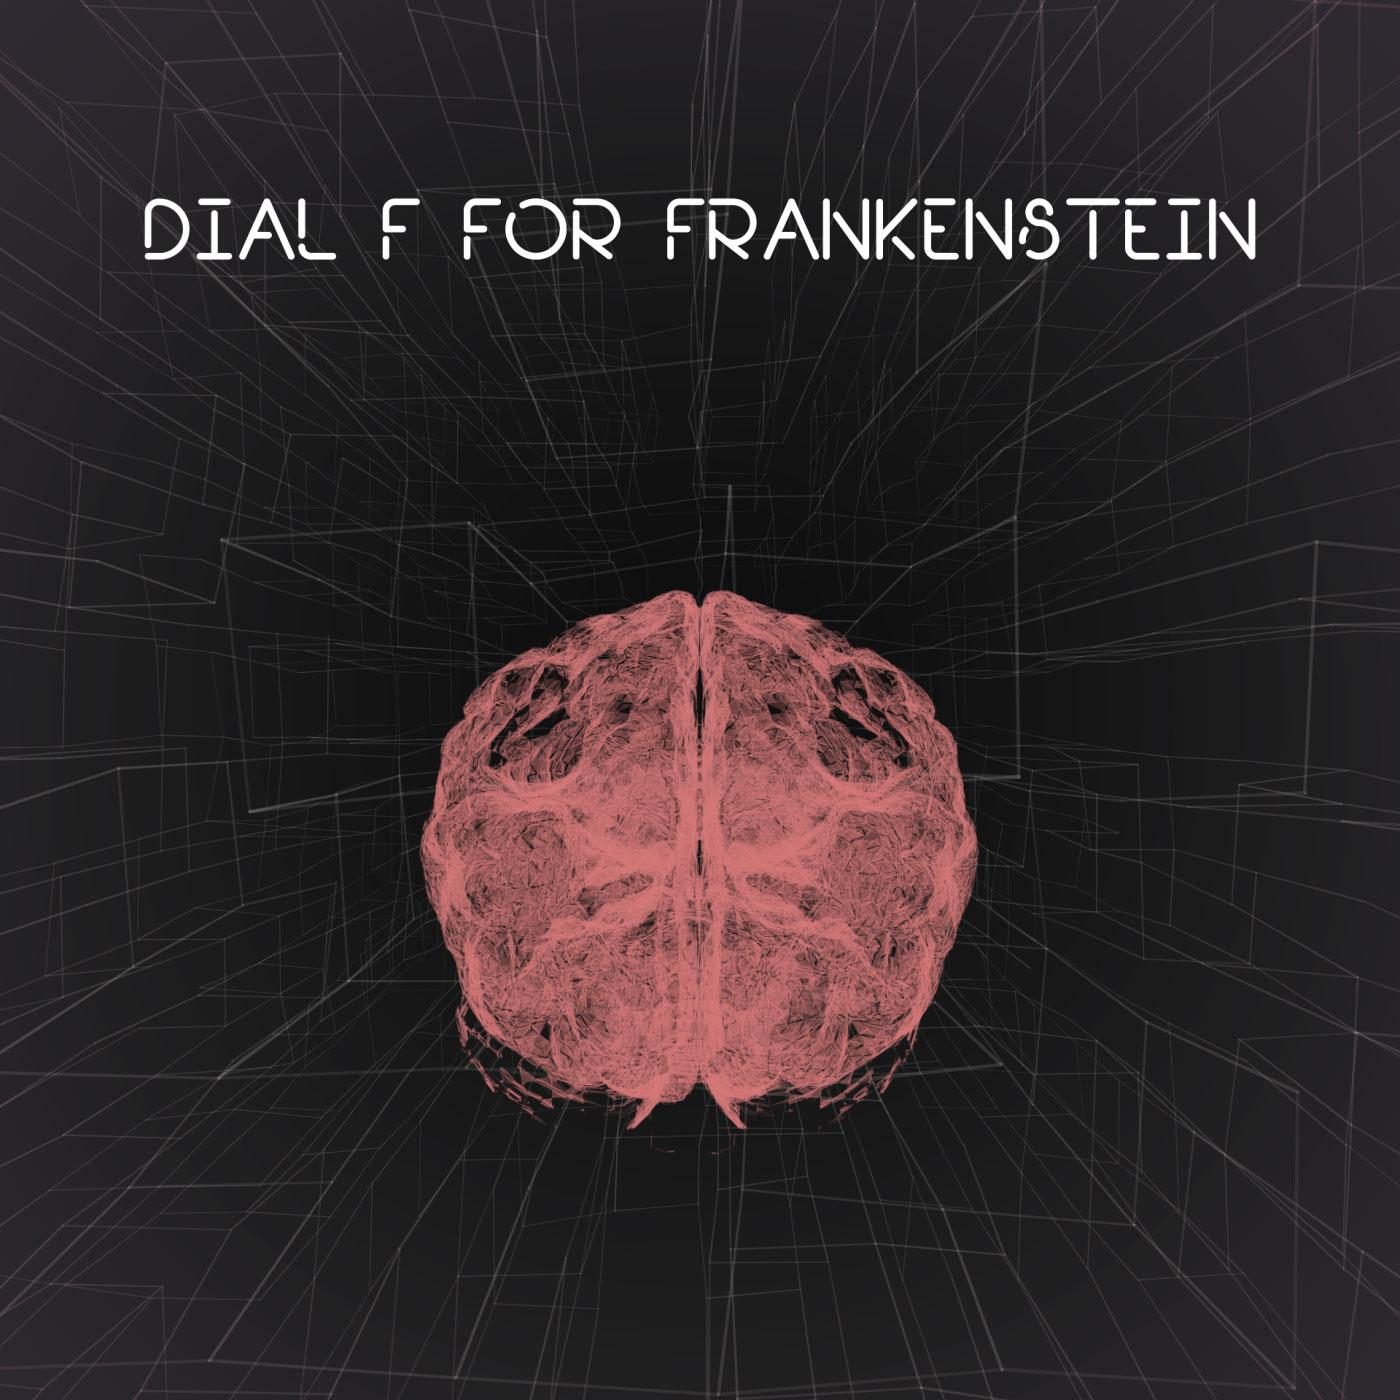 DIAL F FOR FRANKENSTEIN   با حرف اف با فرانکشتین تماس بگیر